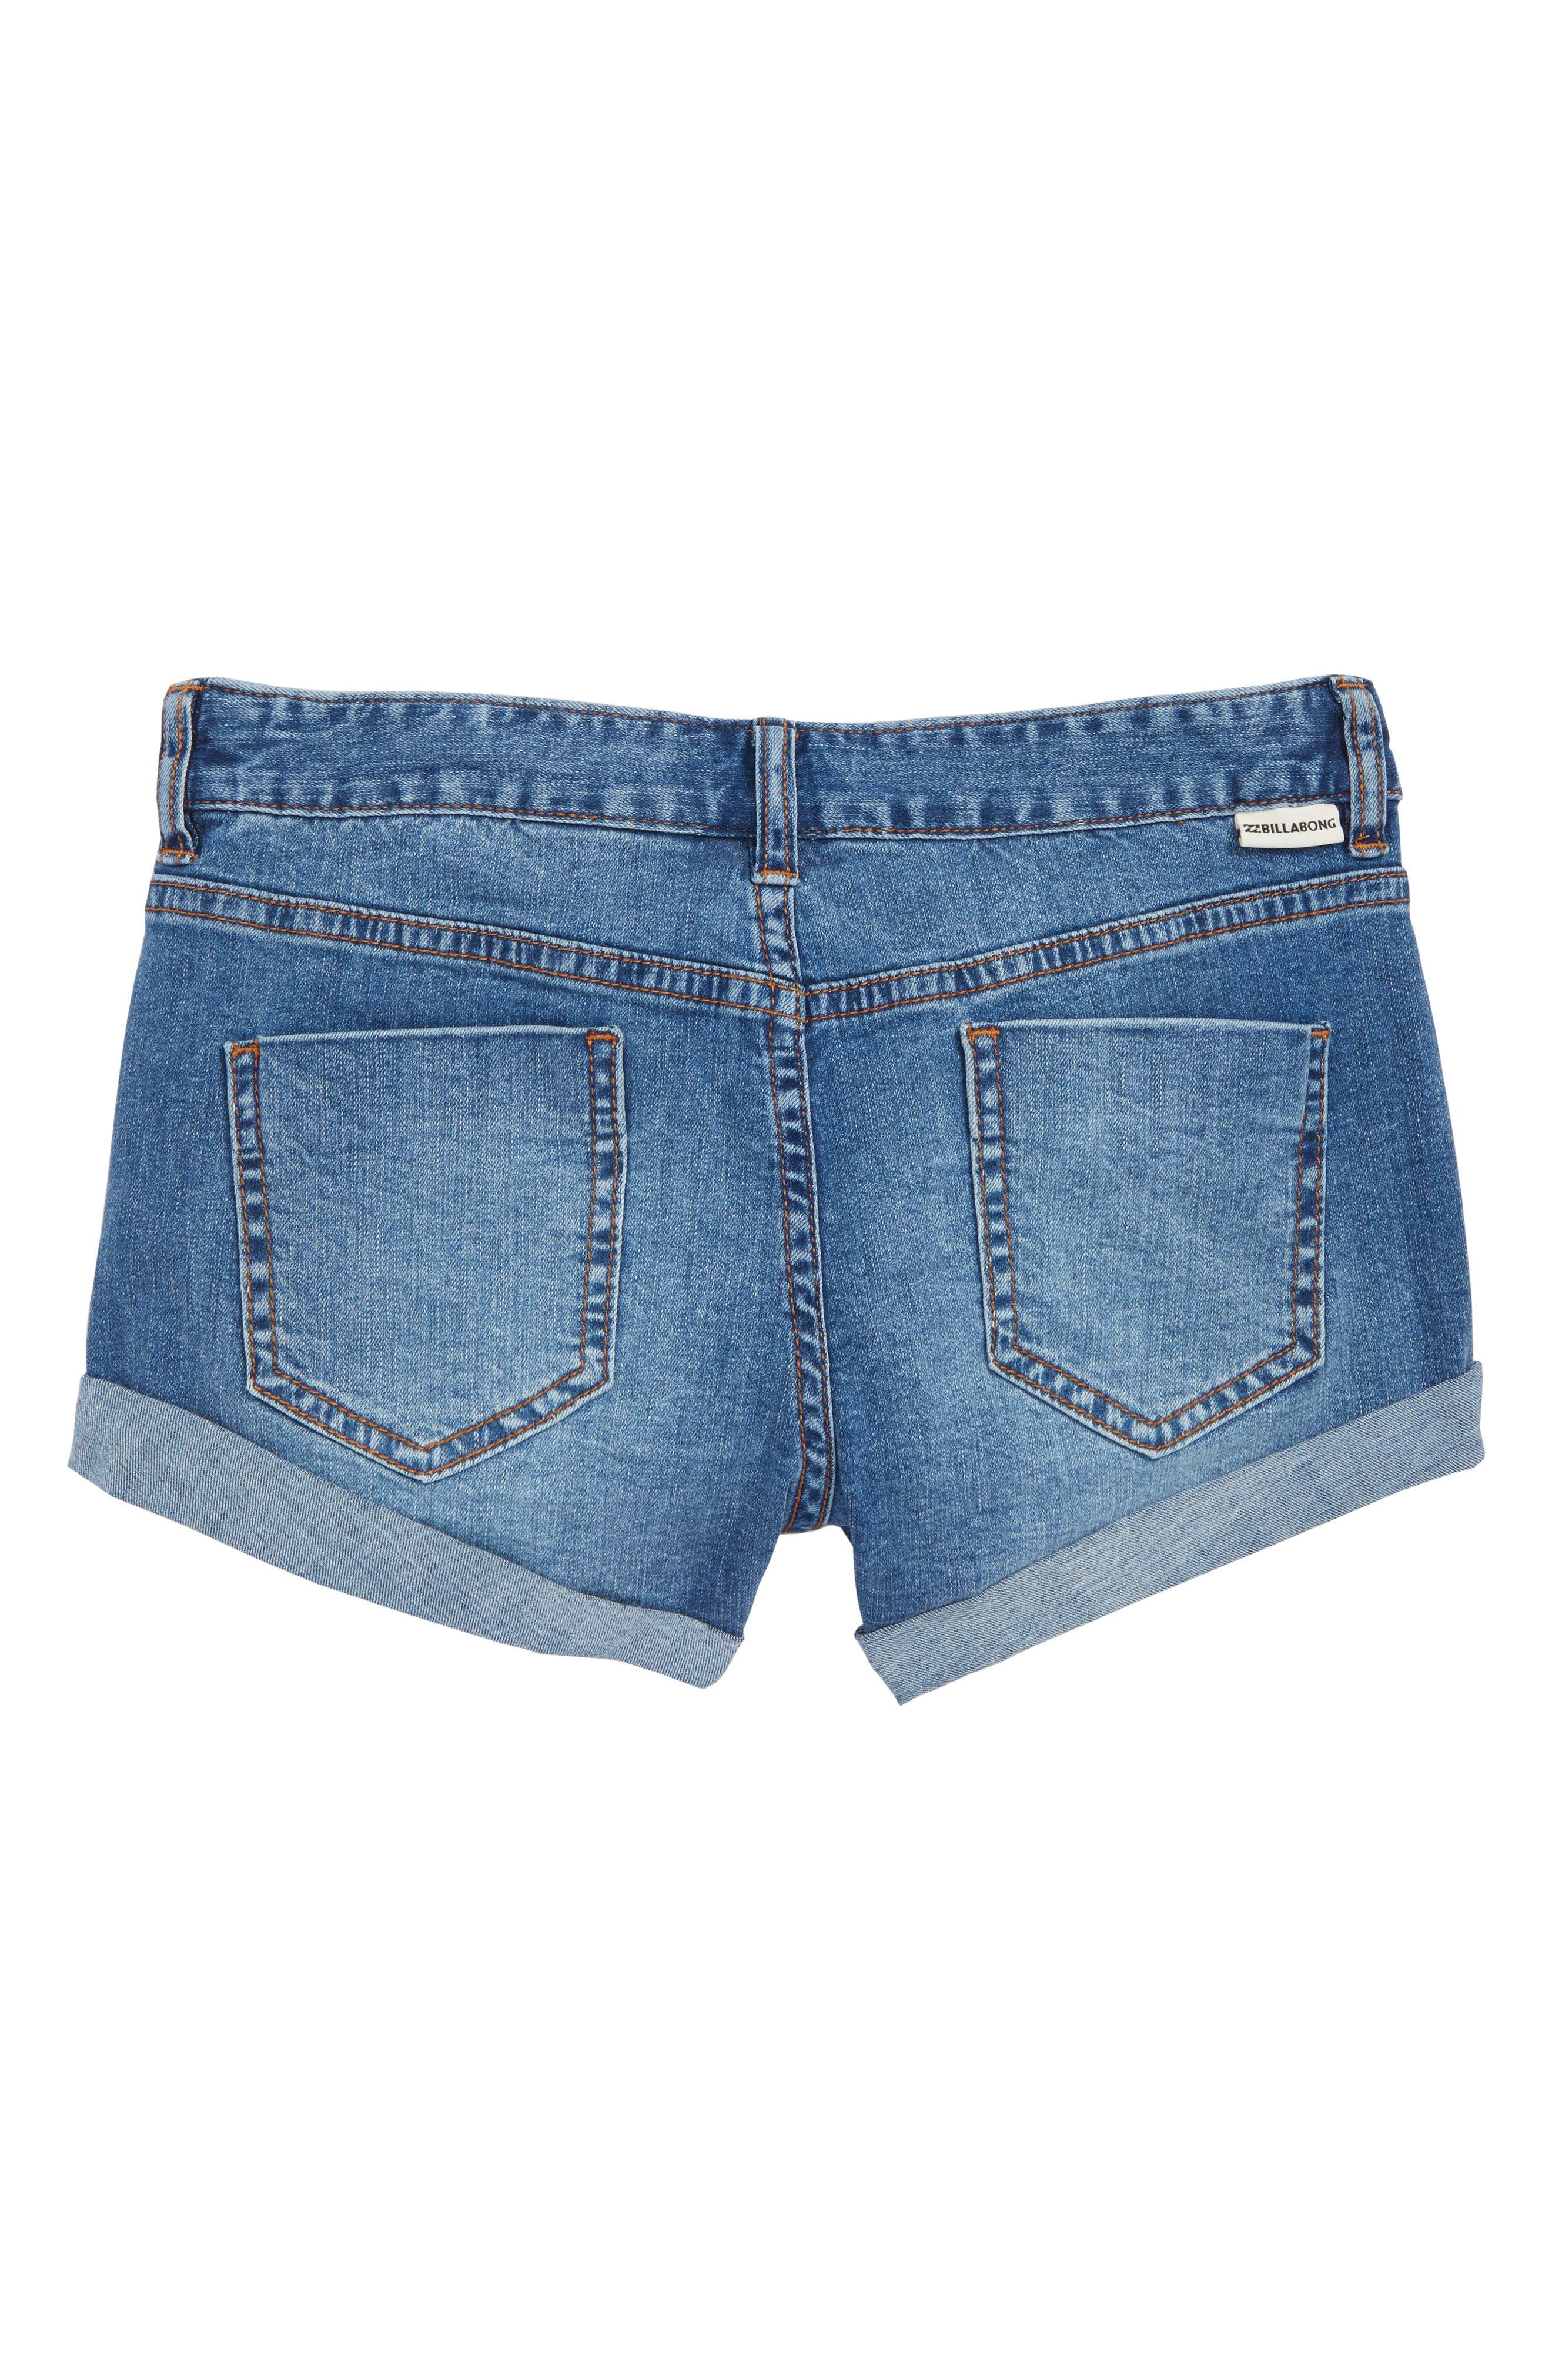 Cool Side Patch Denim Shorts,                             Alternate thumbnail 2, color,                             Beach Blue